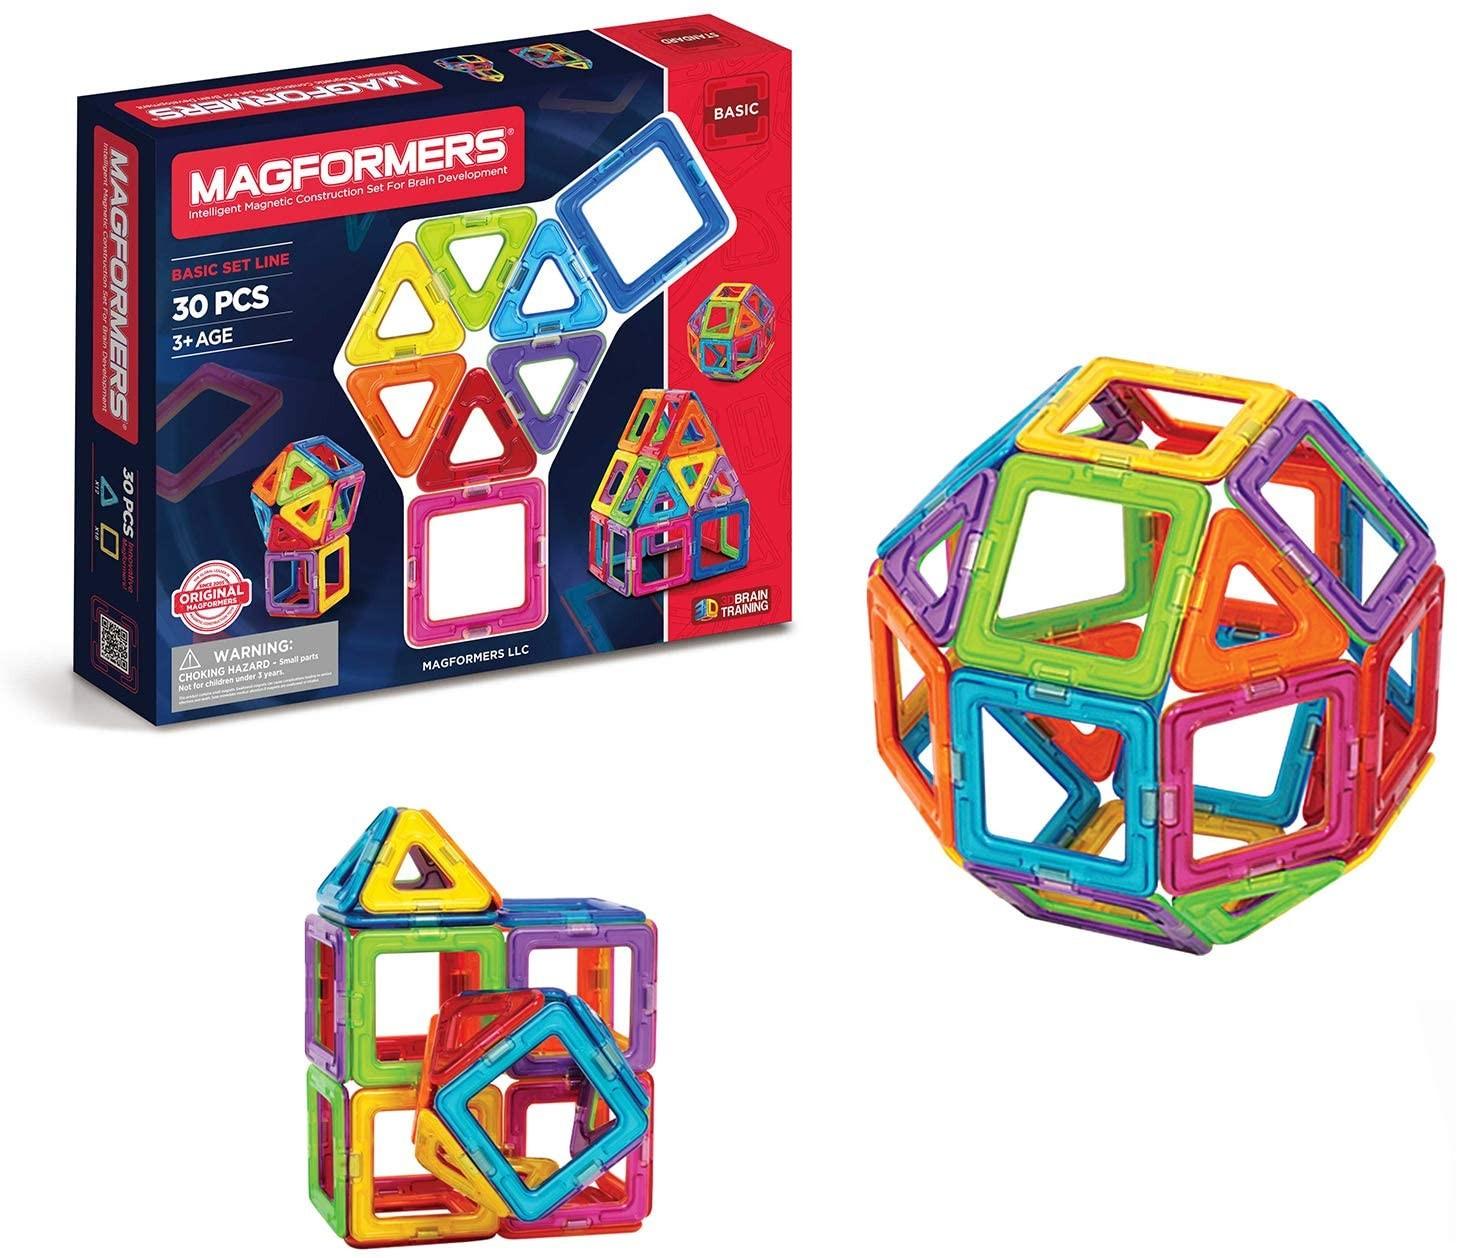 Magformers -Set magnetic de construit - Basic 30 - 1